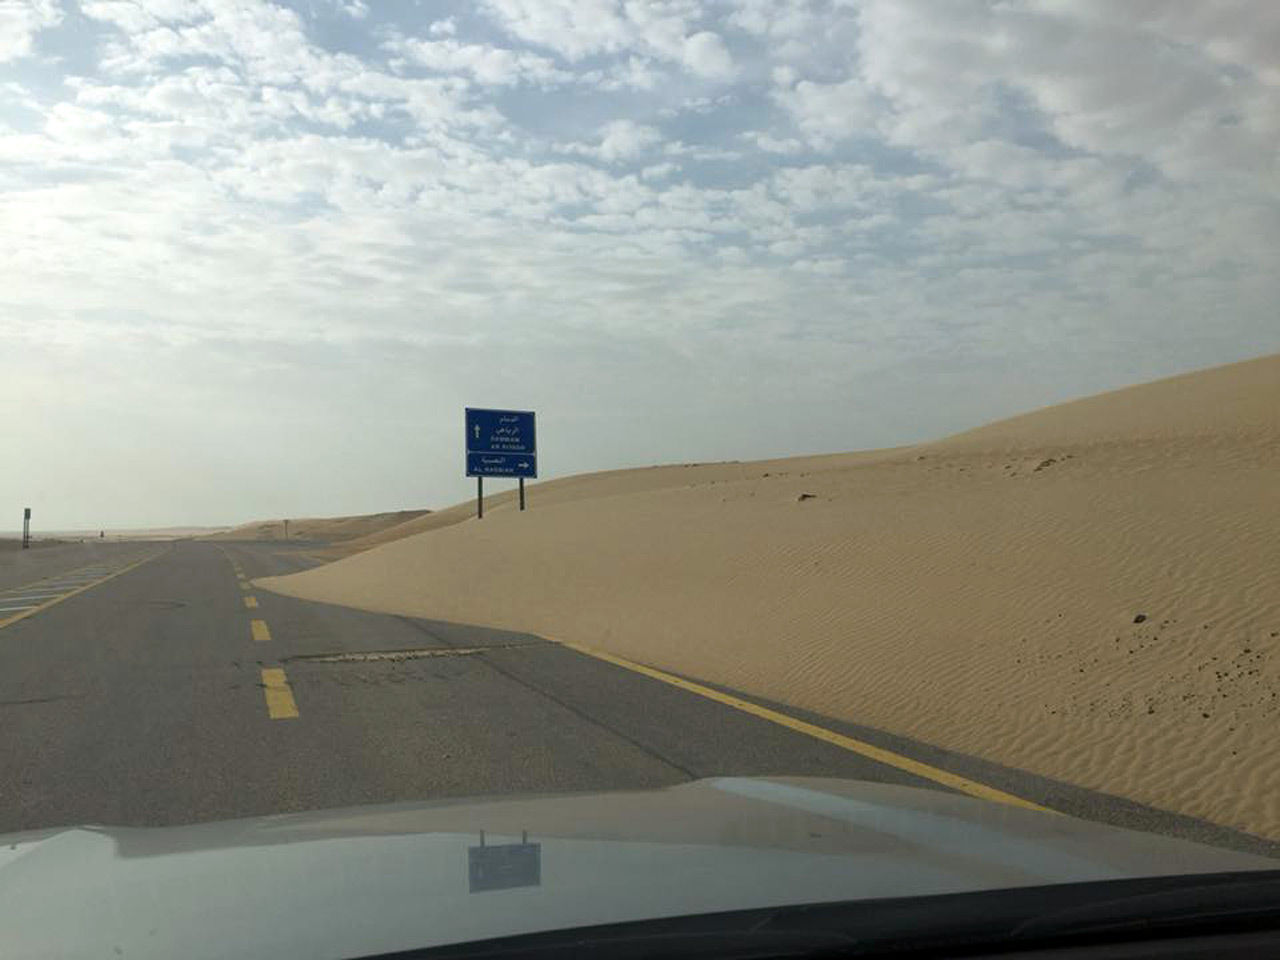 Hey, where's my road? - Part II